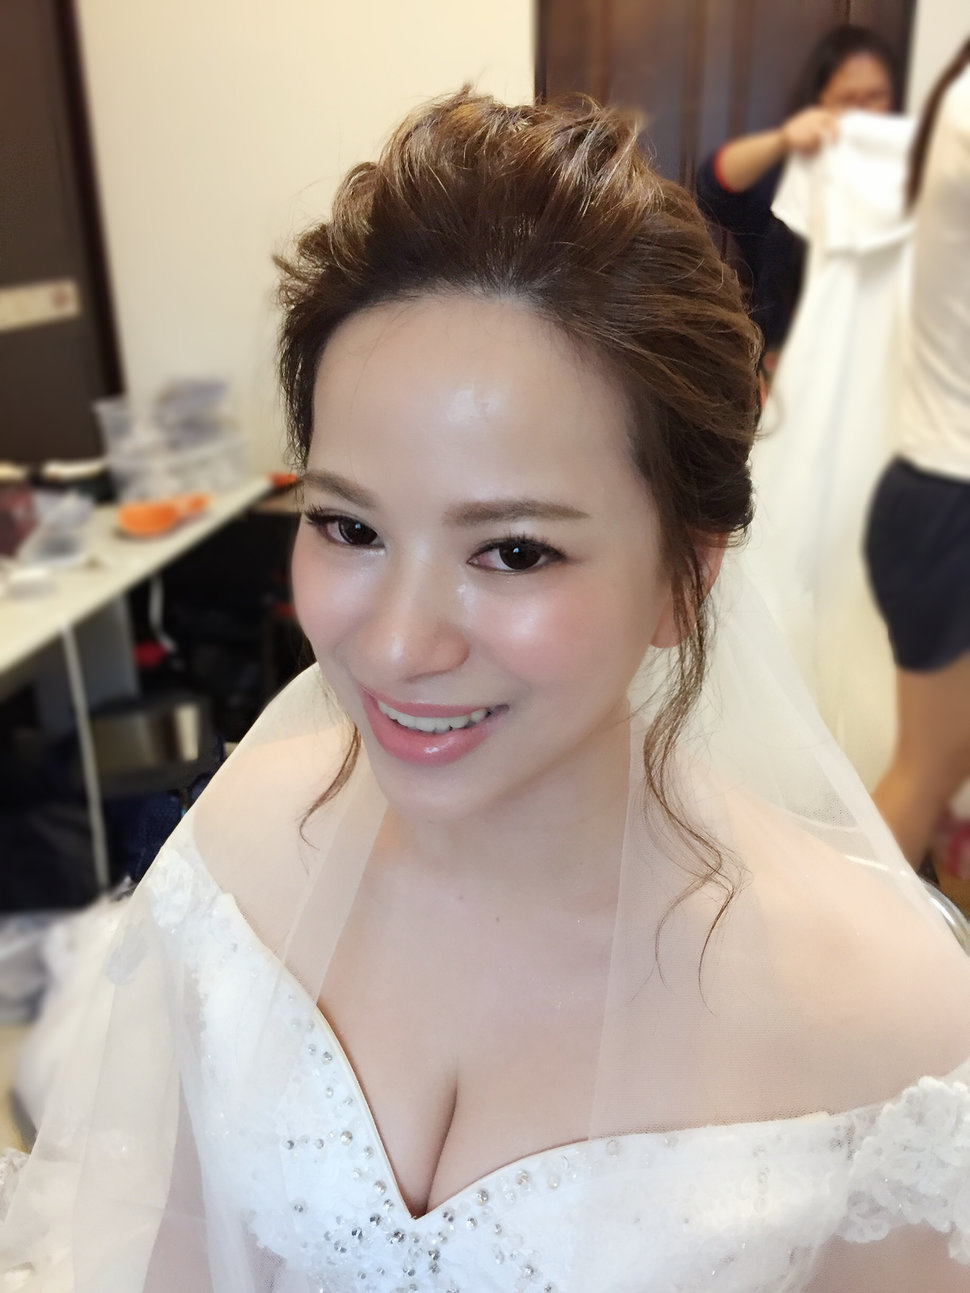 IMG_8595 - 幫您 Bonnie make up《結婚吧》